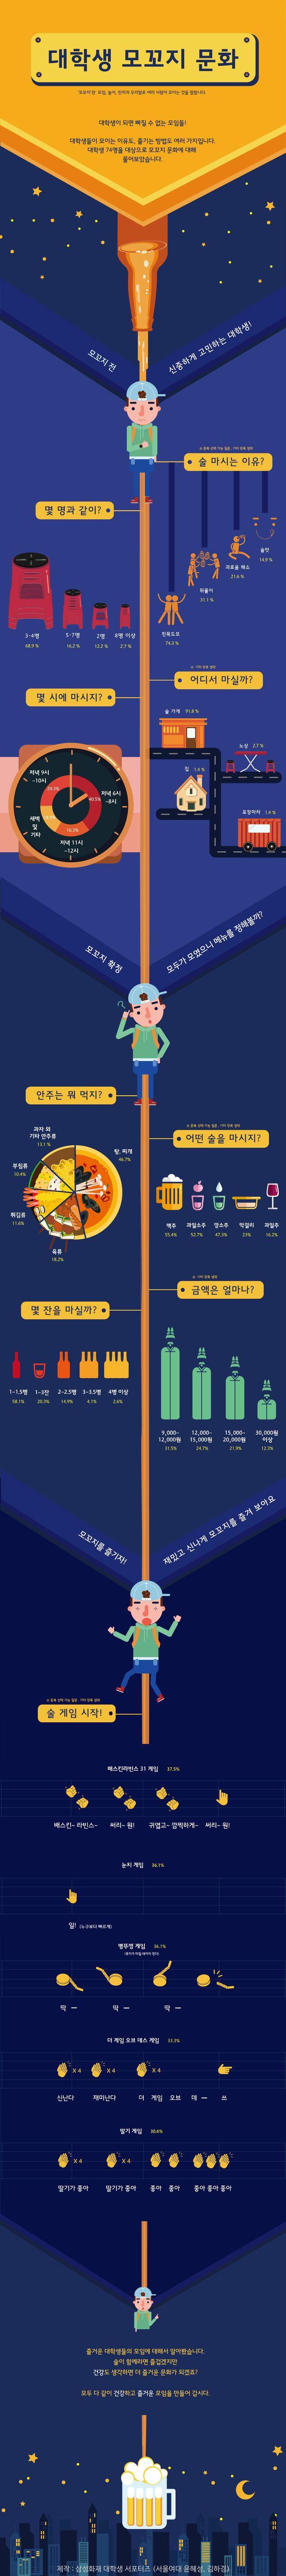 [Infographic] '대학생 모꼬지 문화'에 대한 삼성화재 화제만발 블로그의 인포그래픽